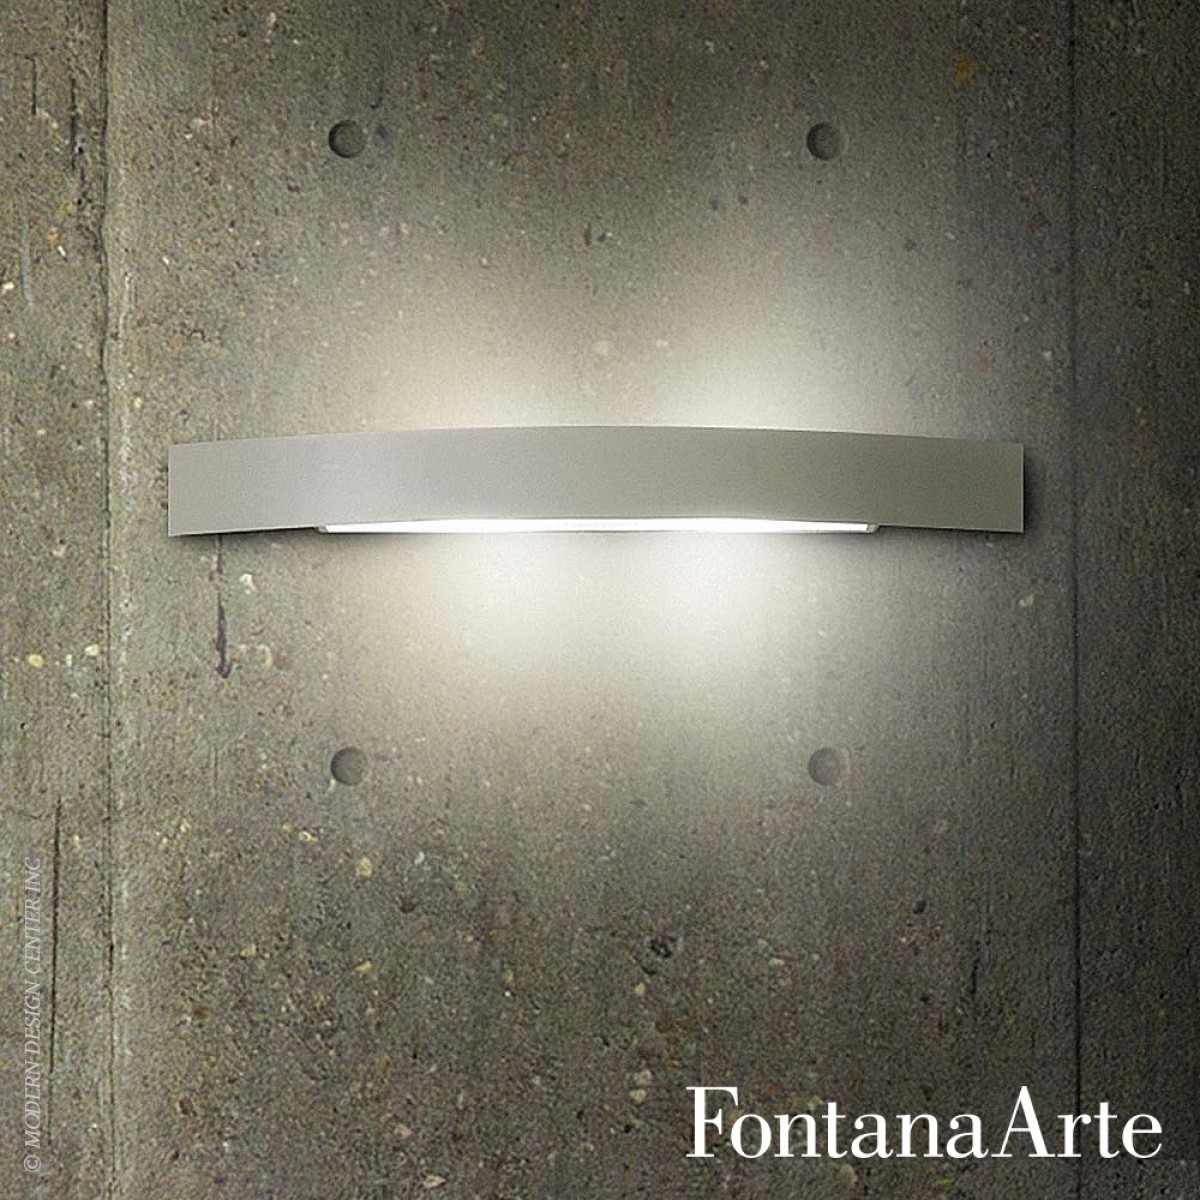 FontanaArte Riga 36 Inox Wall Lamp Outlet | Desout.com